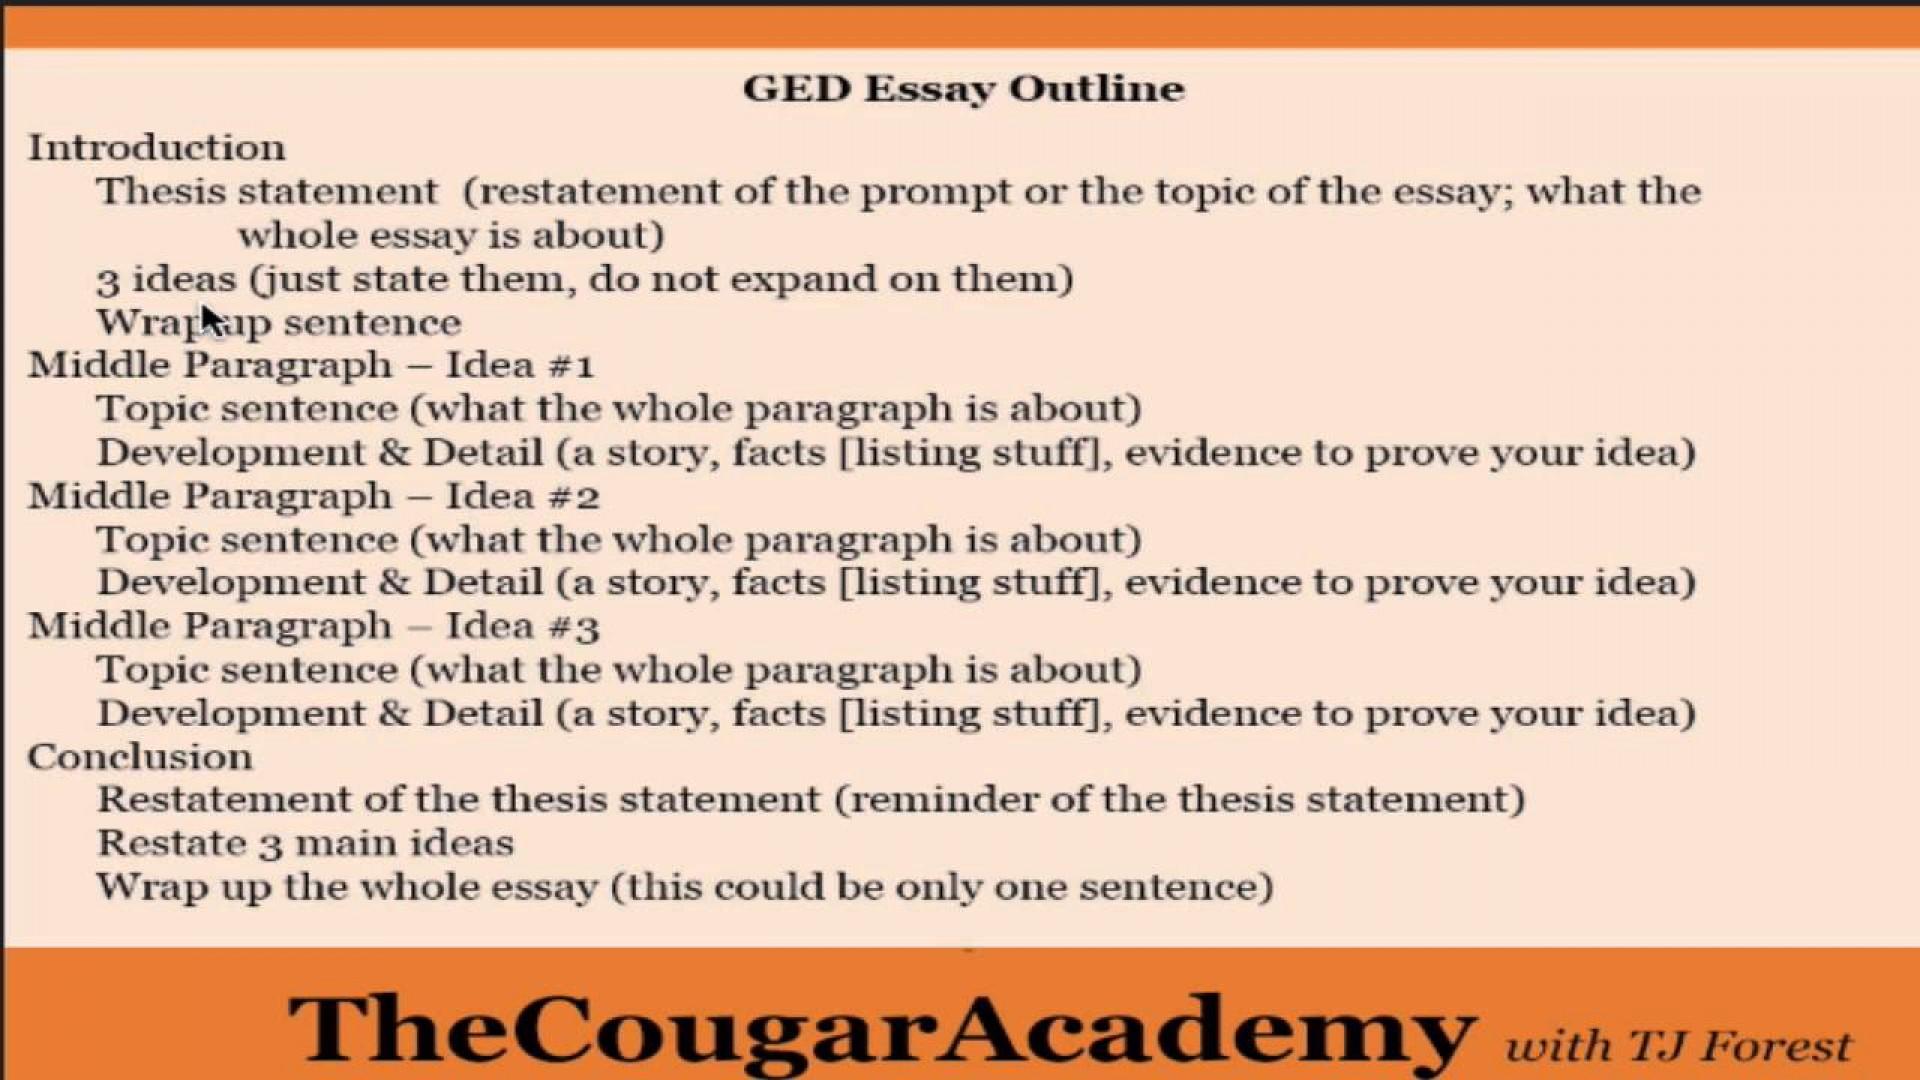 020 Maxresdefault Sample Ged Essays With Scores Essay Rare Pdf 1920